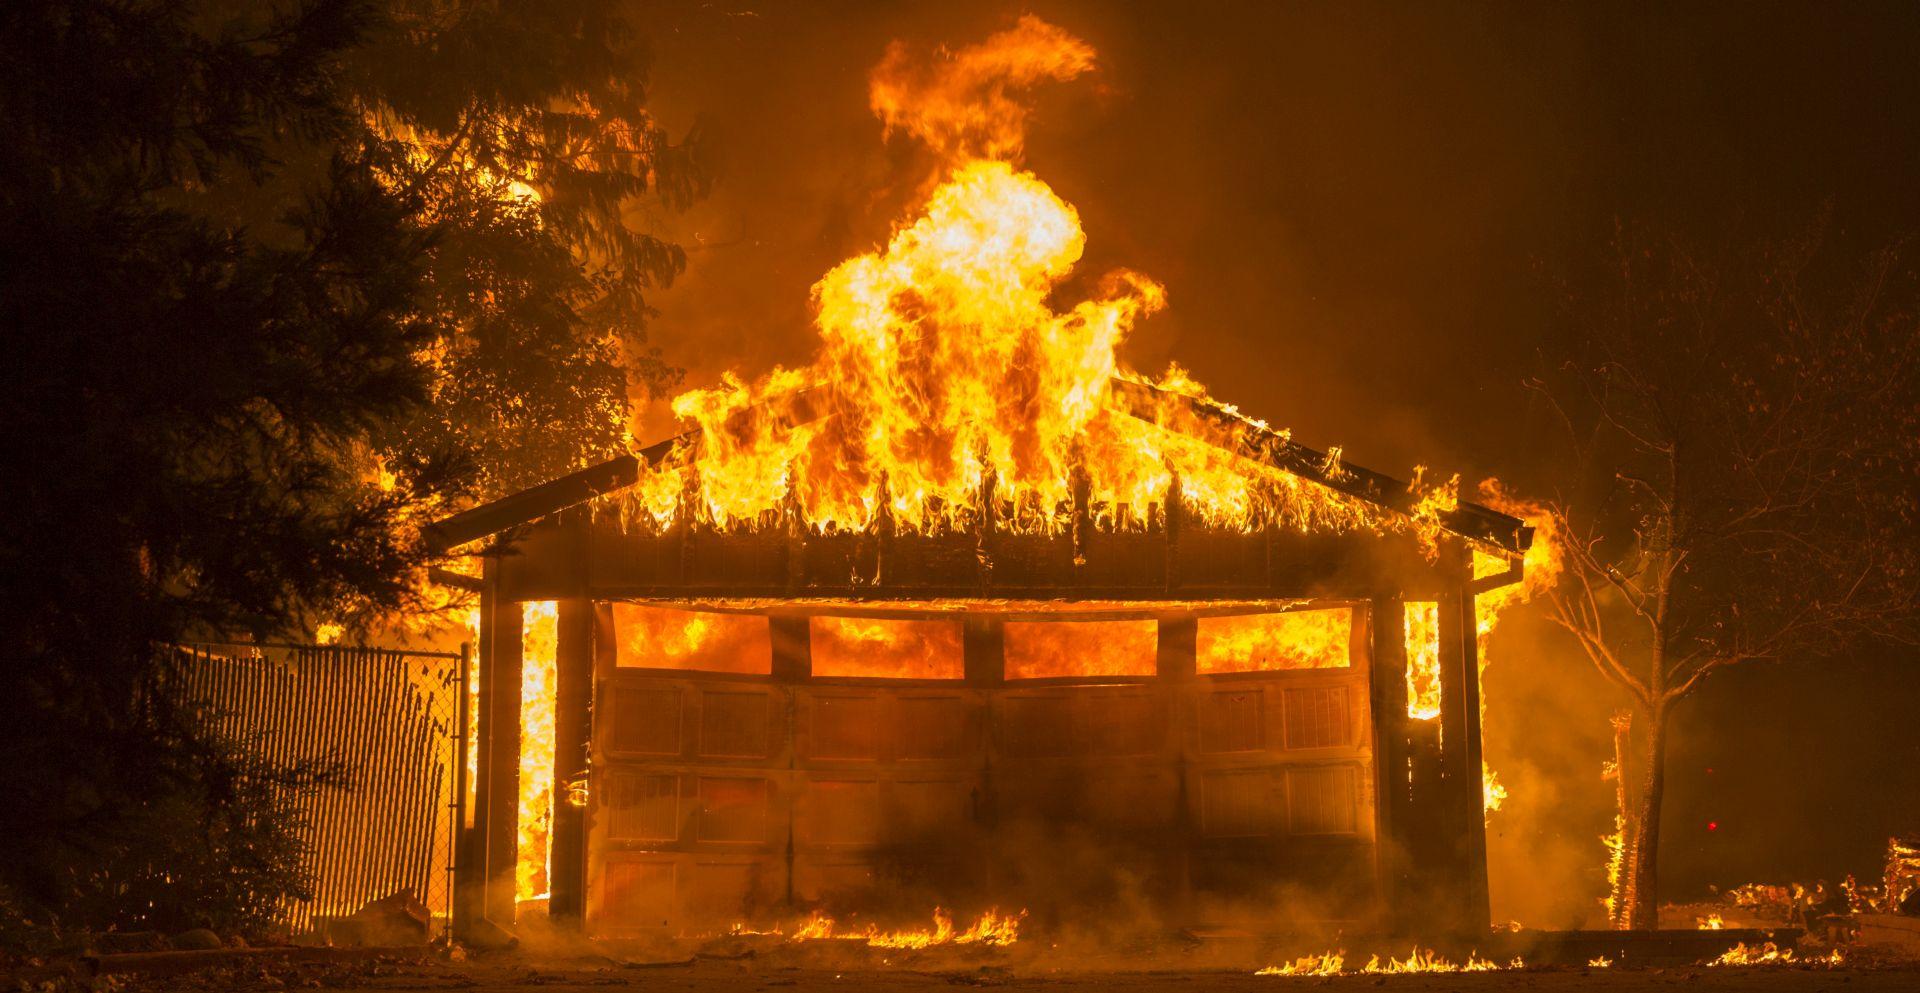 Kalifornijski inferno guta sve pred sobom